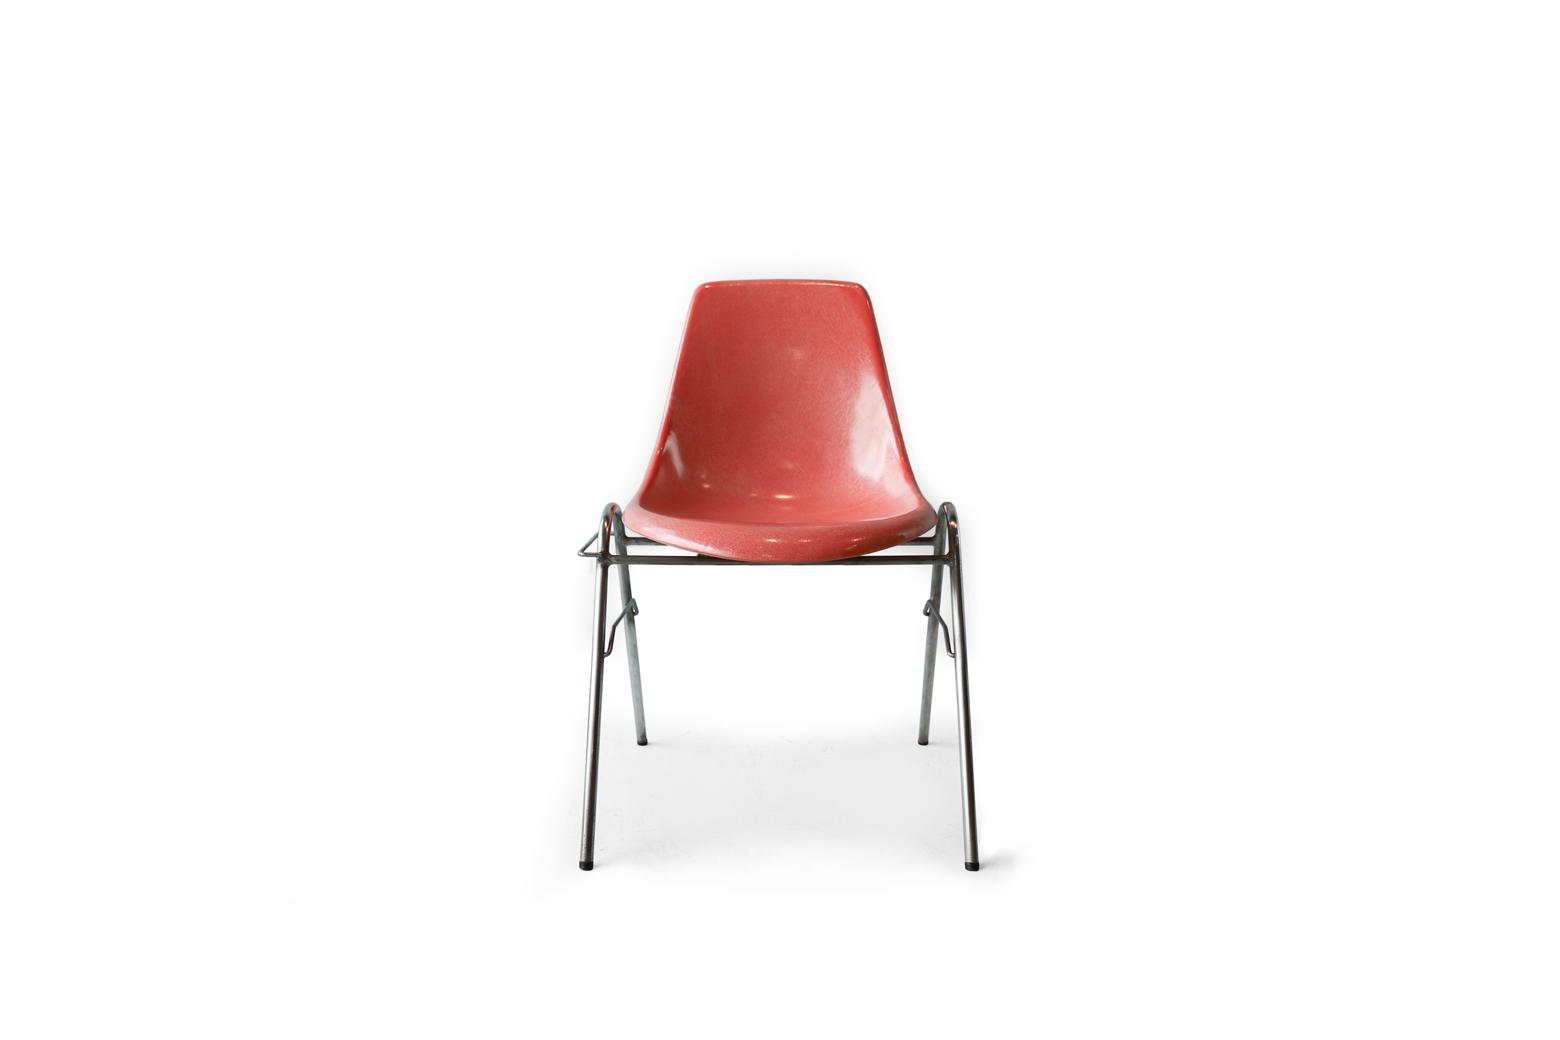 Modern Design SORI YANAGI Stacking Shell Chair/柳宗理 スタッキングチェア コトブキ製 FRP モダンデザイン